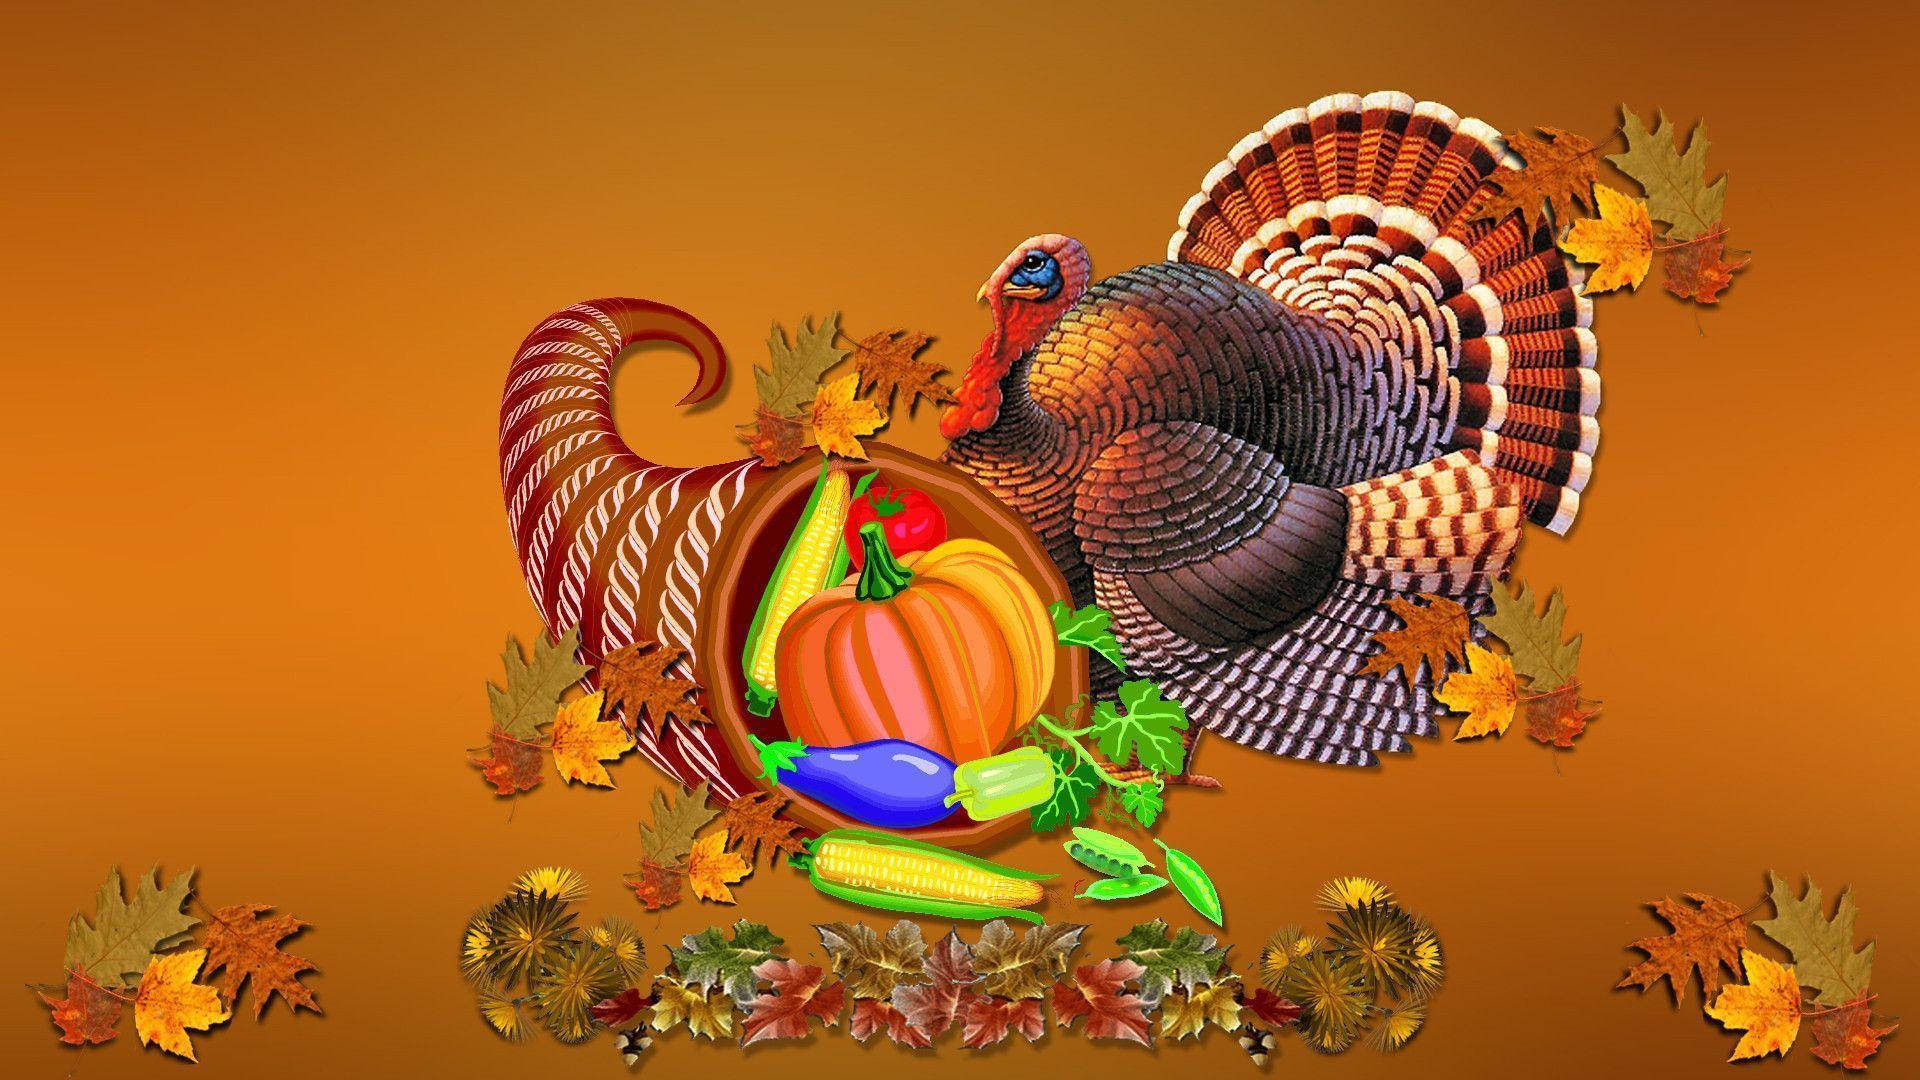 Turkey Thanksgiving Wallpapers - Wallpaper Cave